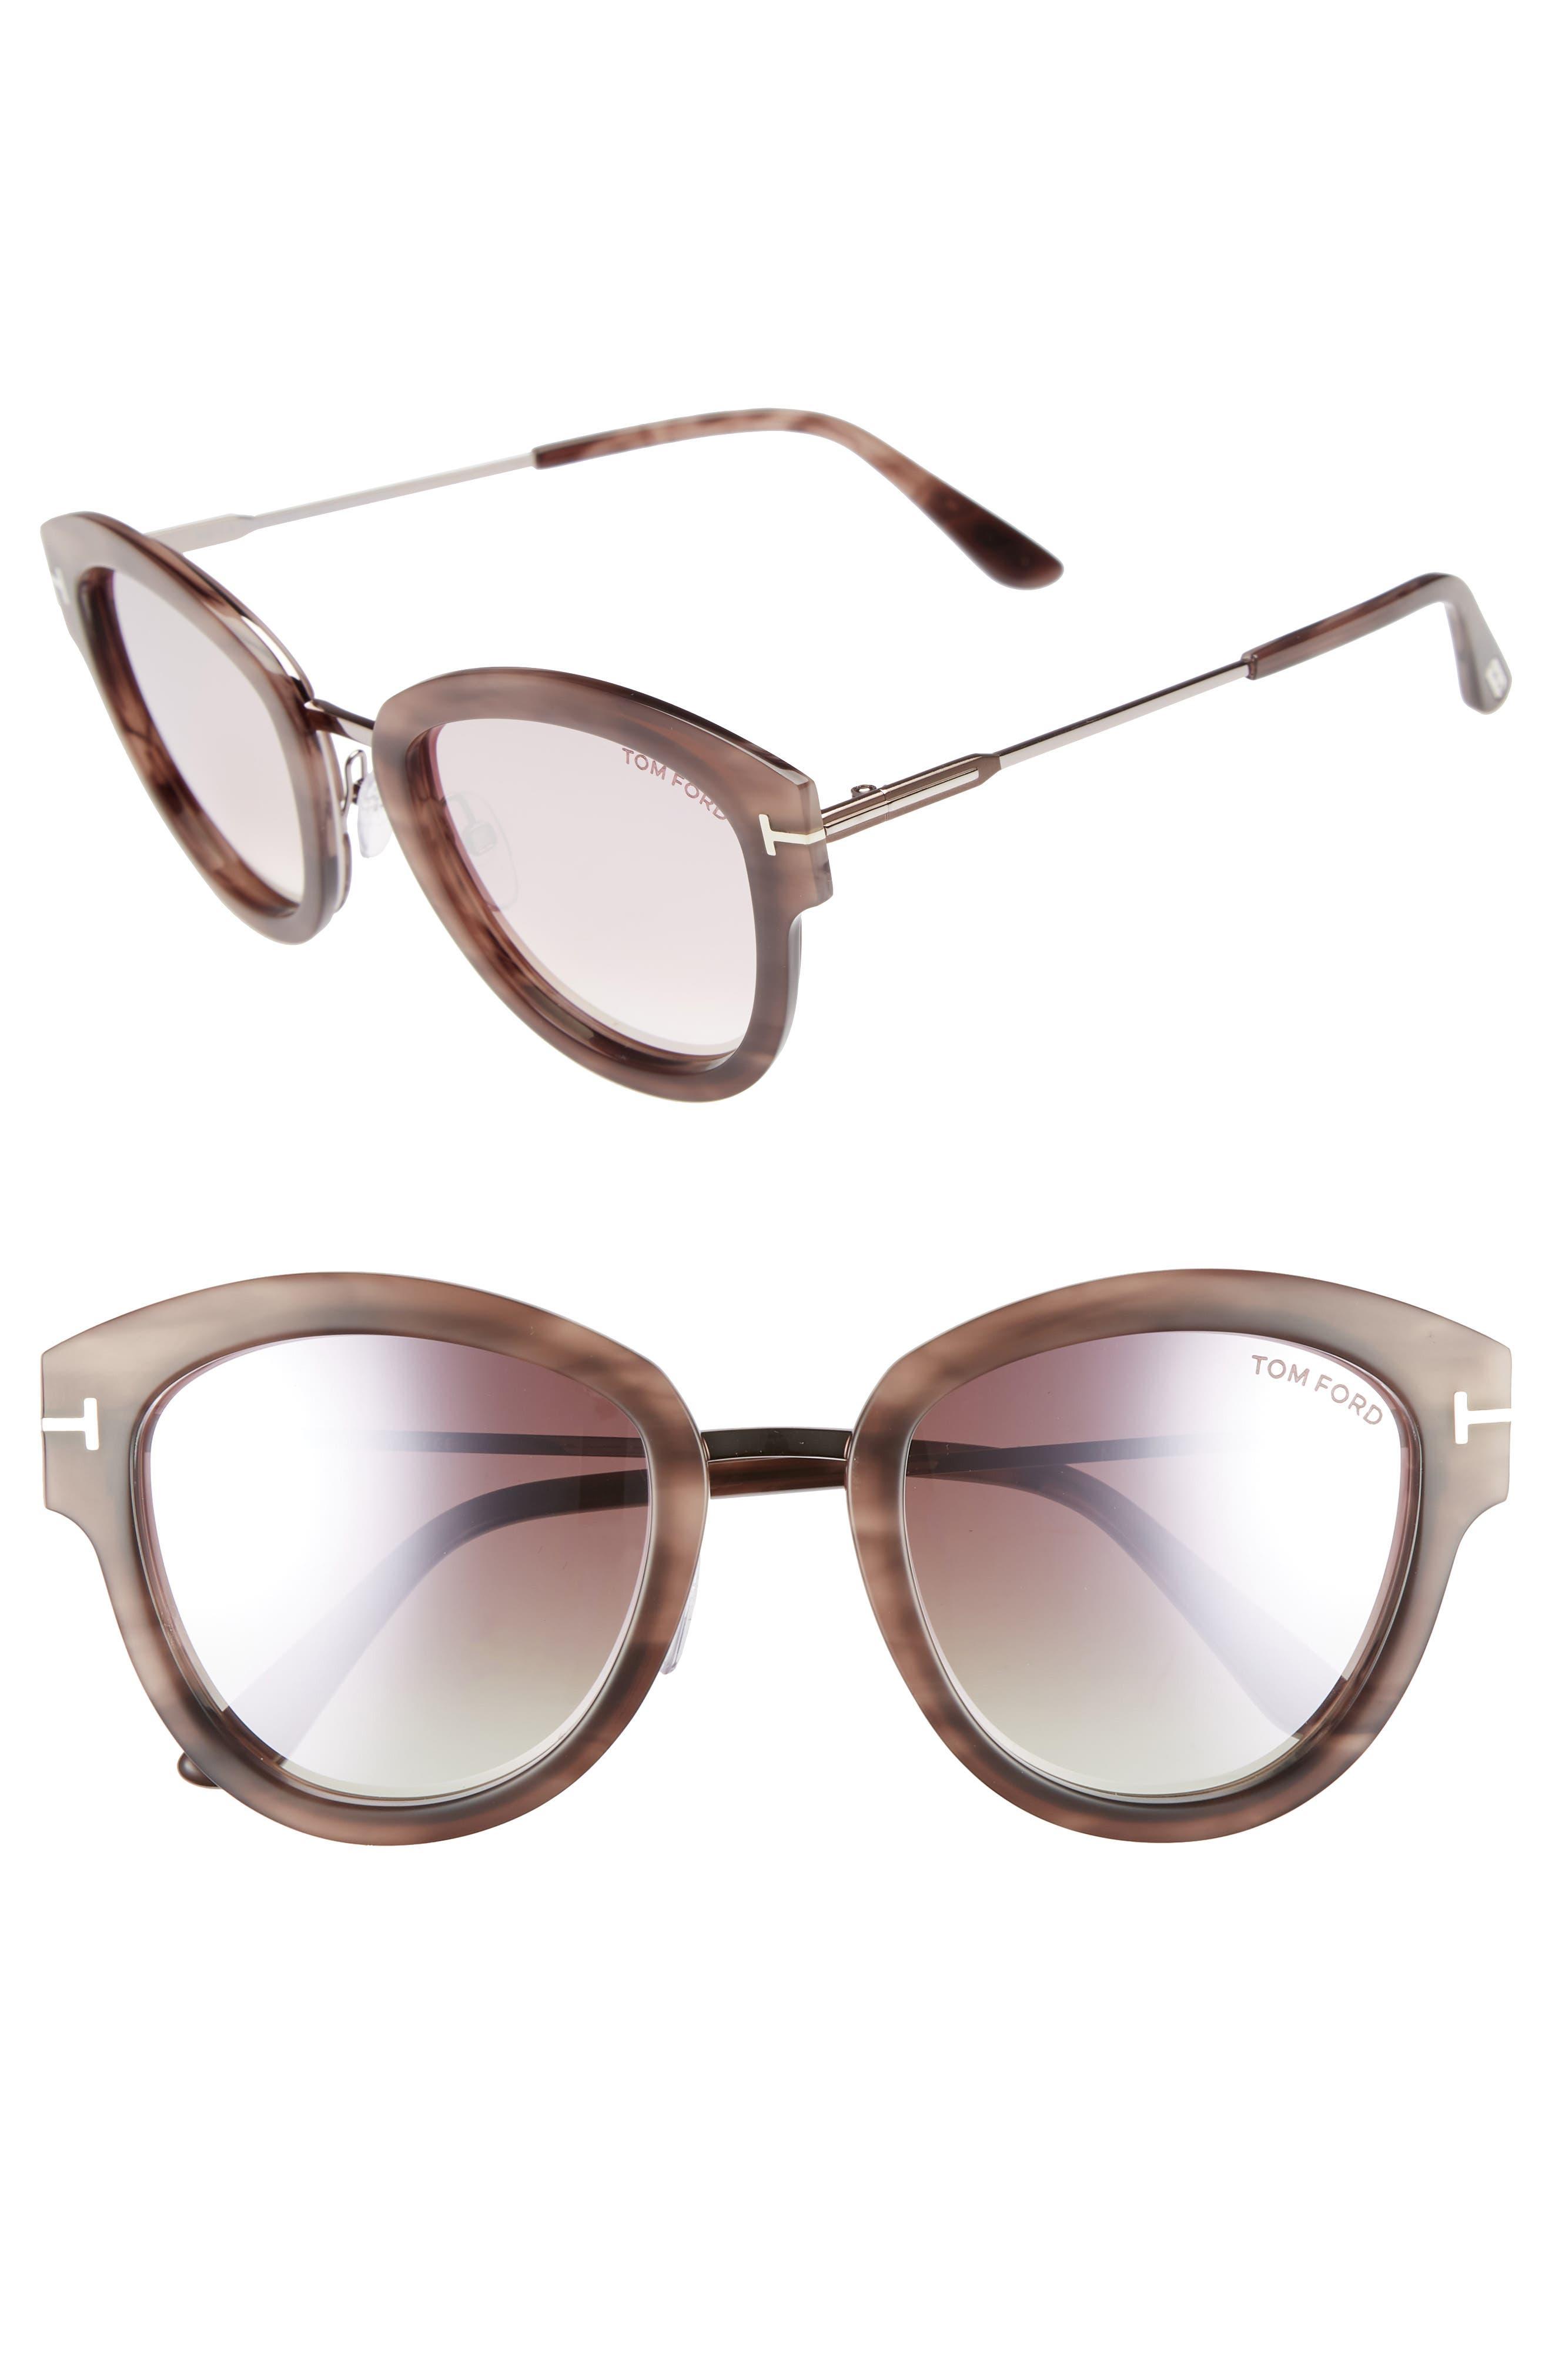 Mia 55Mm Cat Eye Sunglasses - Pink Melange Havana Acetate